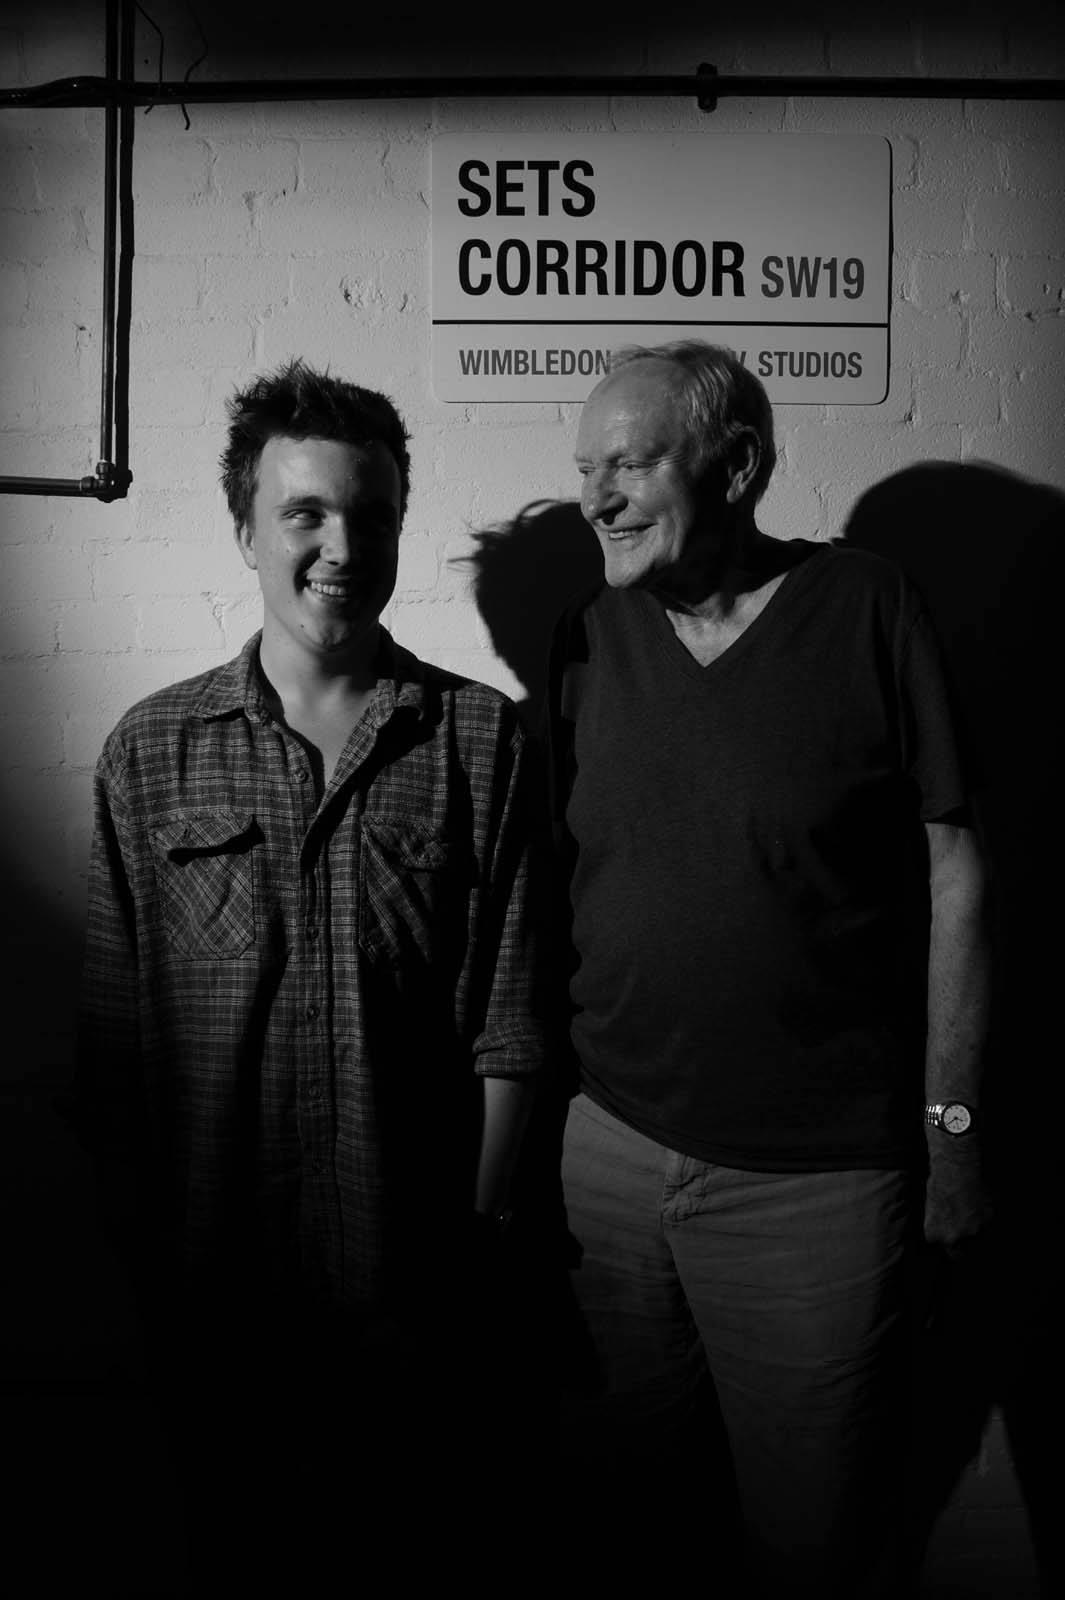 Director Tom Sands alongside the film's villain   Julian Glover